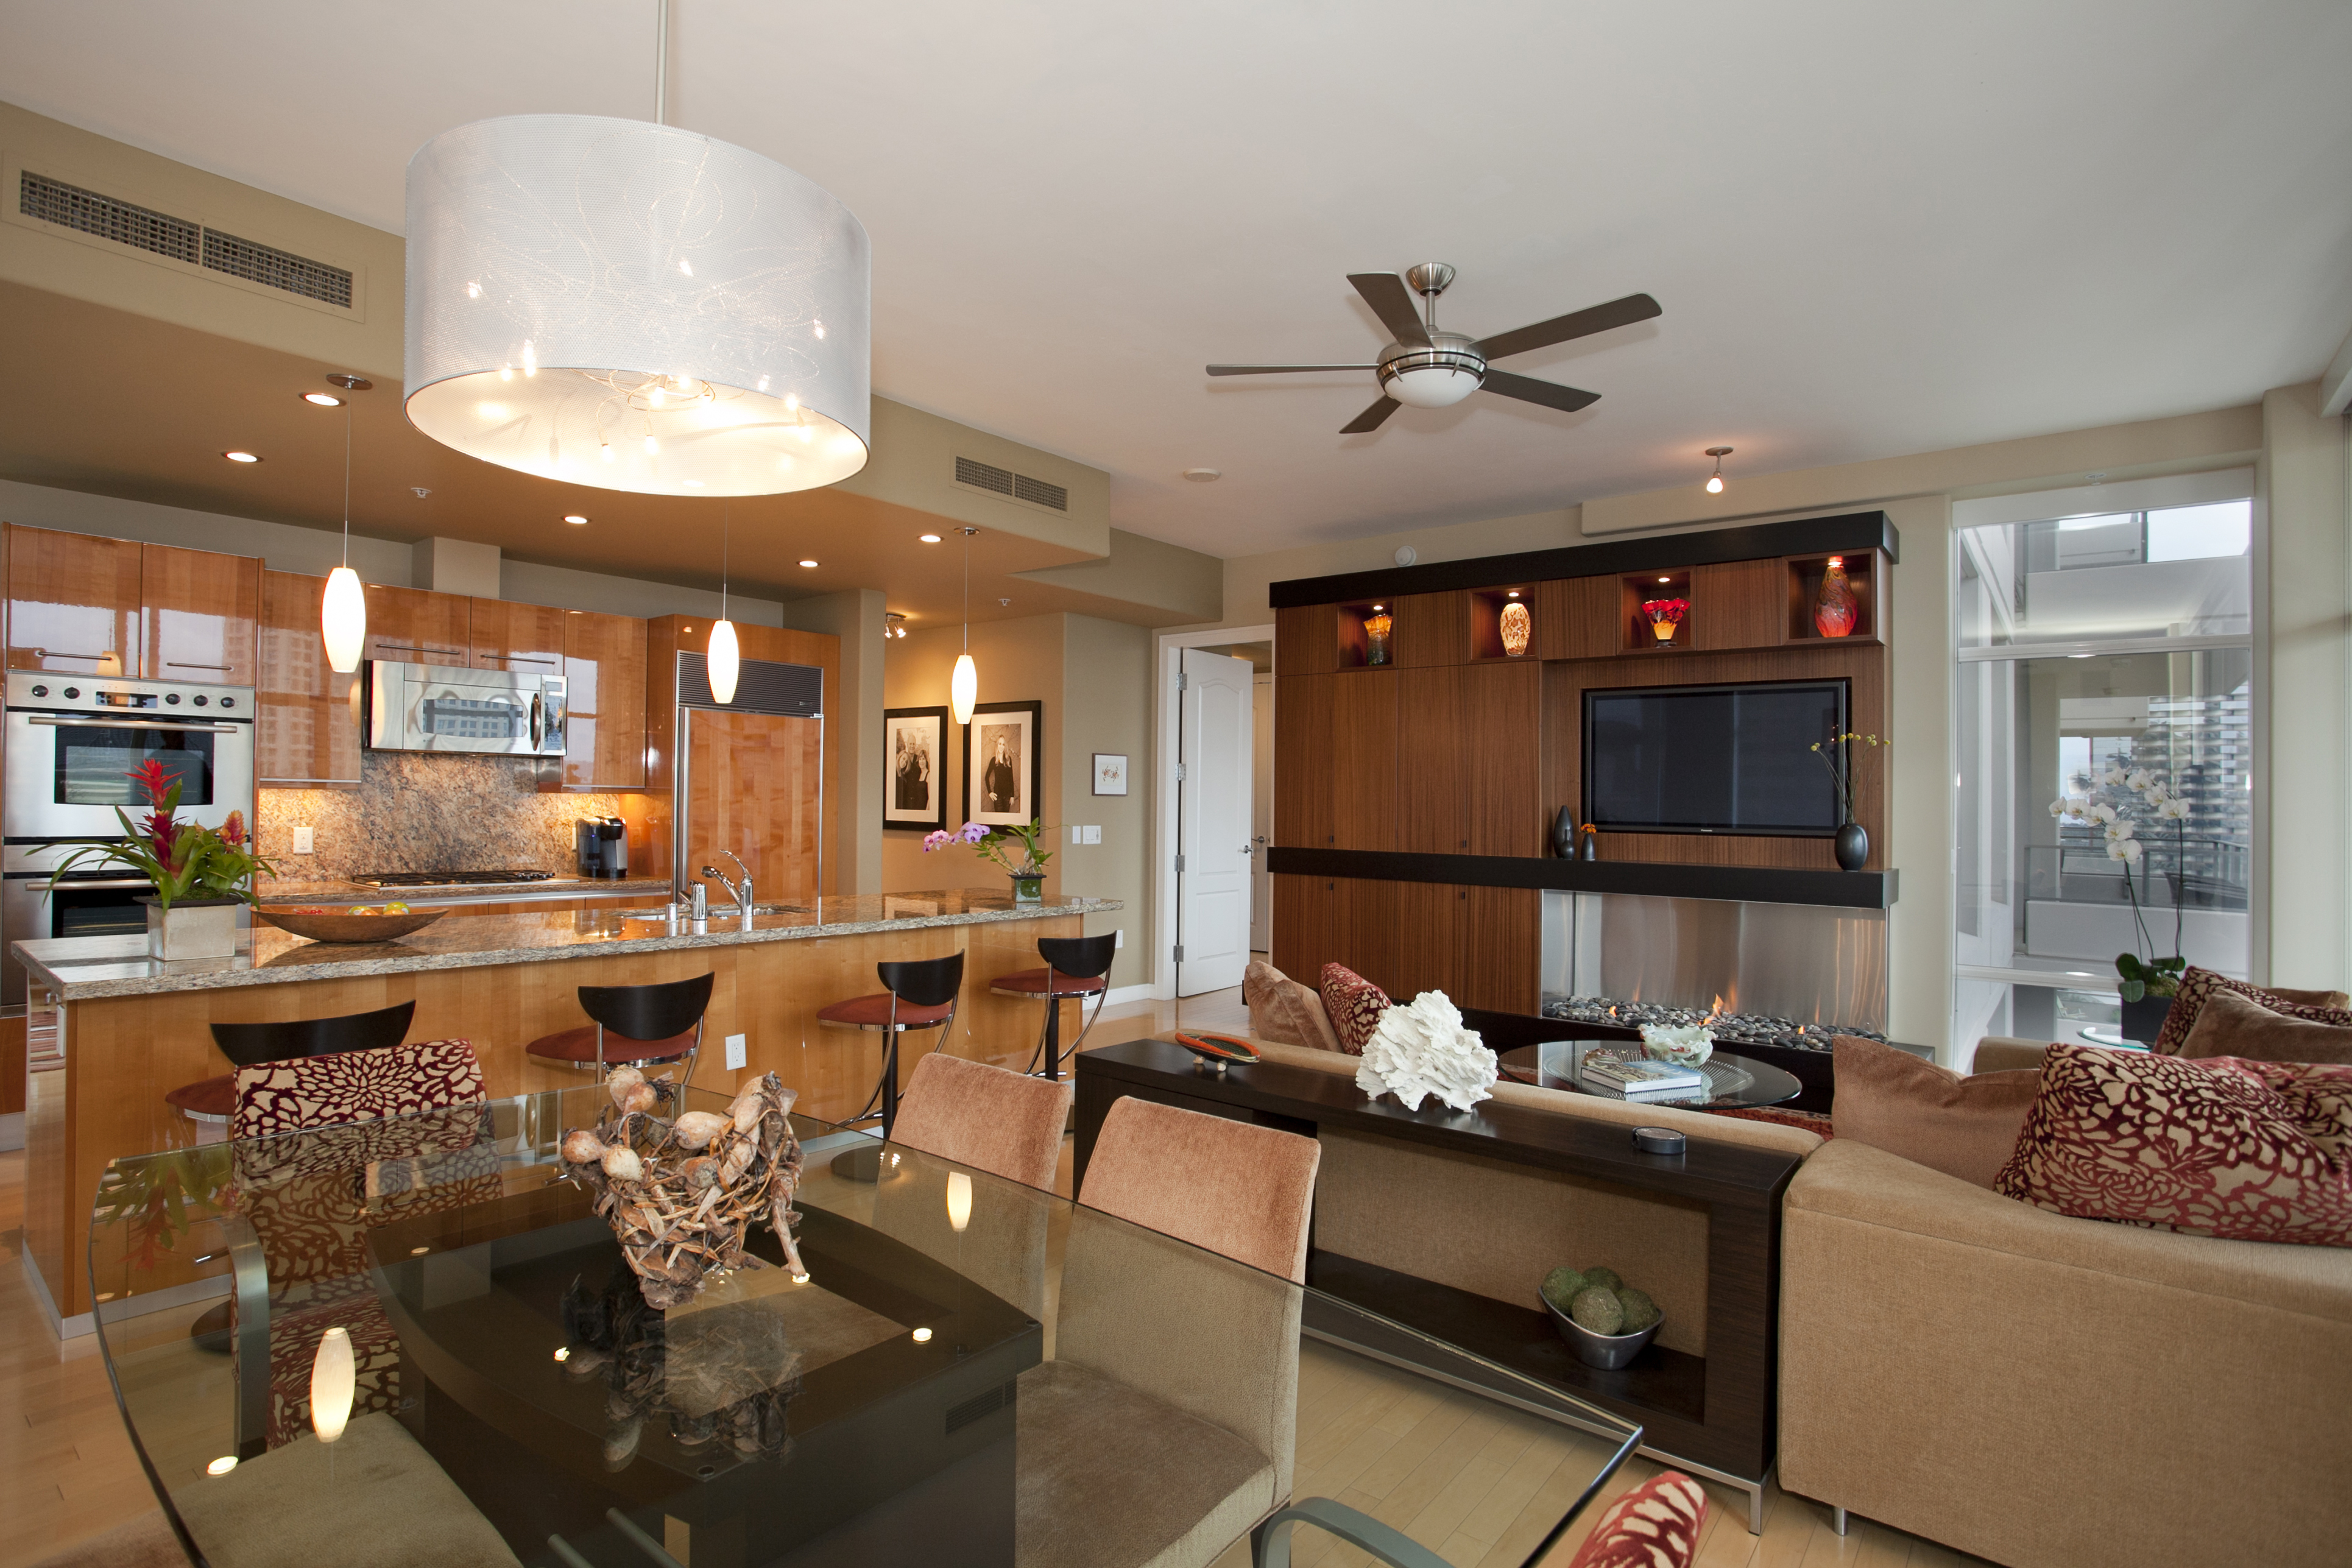 san diego interior design firm j p walters design associates. Black Bedroom Furniture Sets. Home Design Ideas